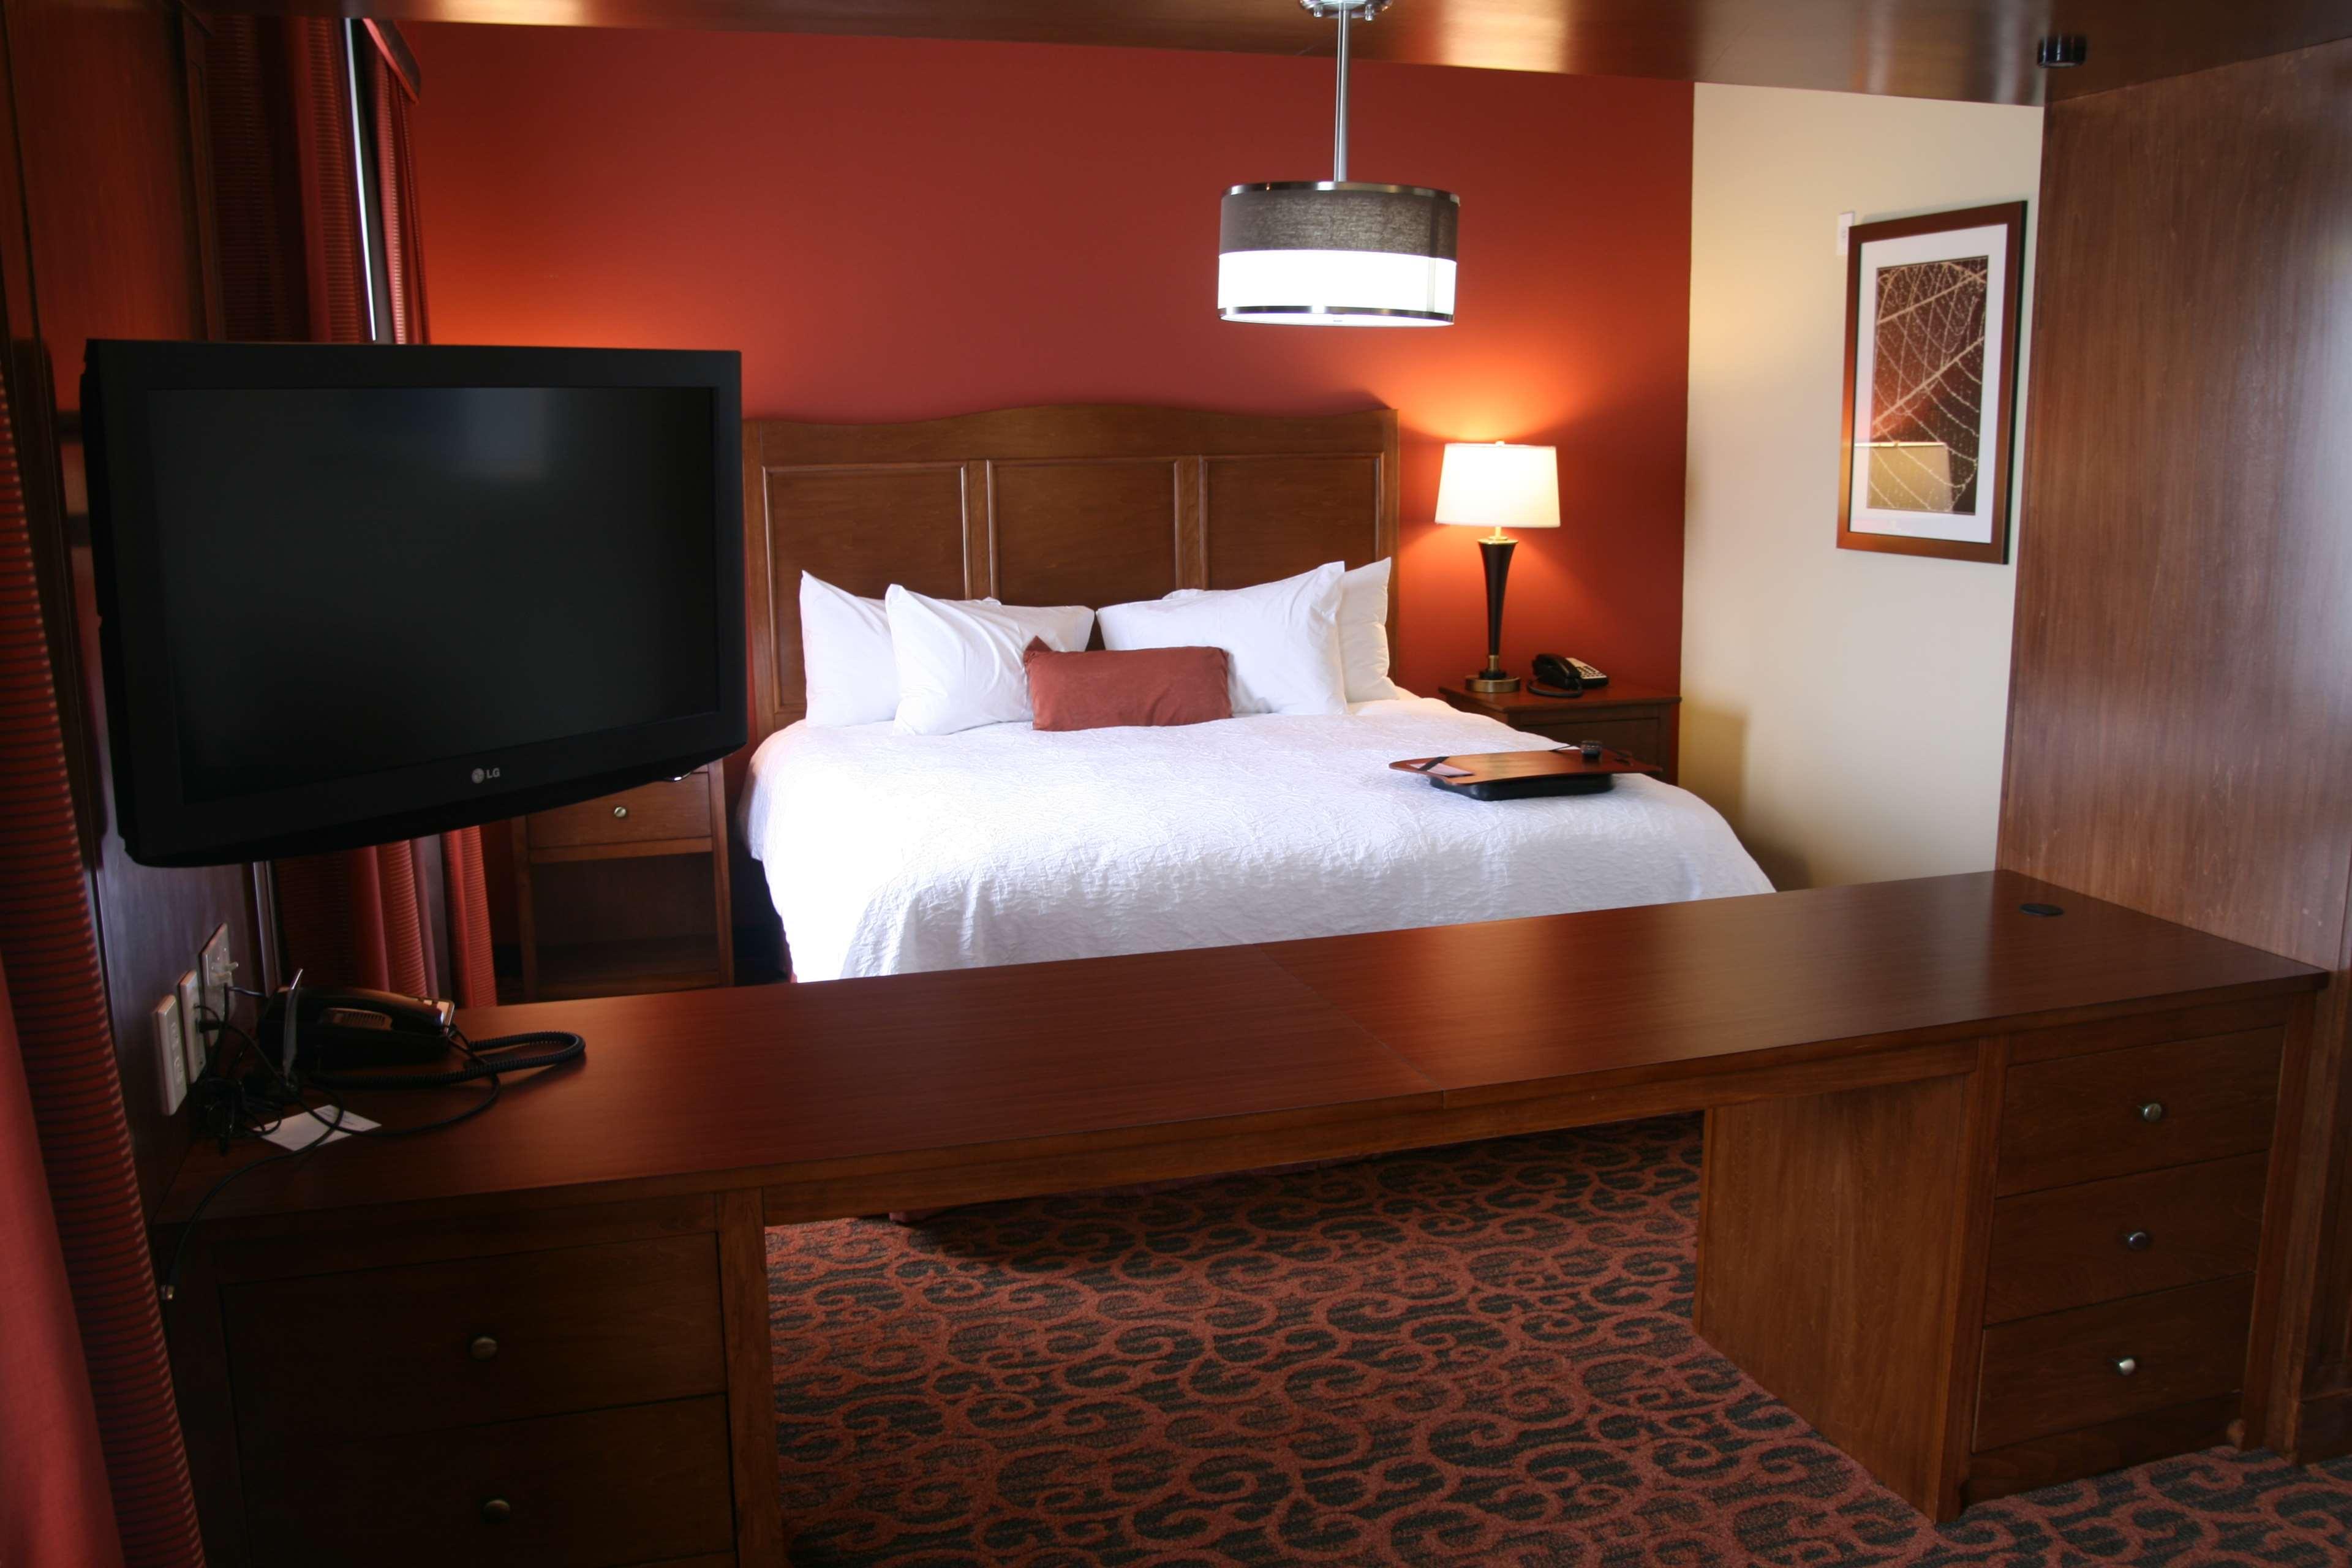 Hampton Inn & Suites Bastrop image 8